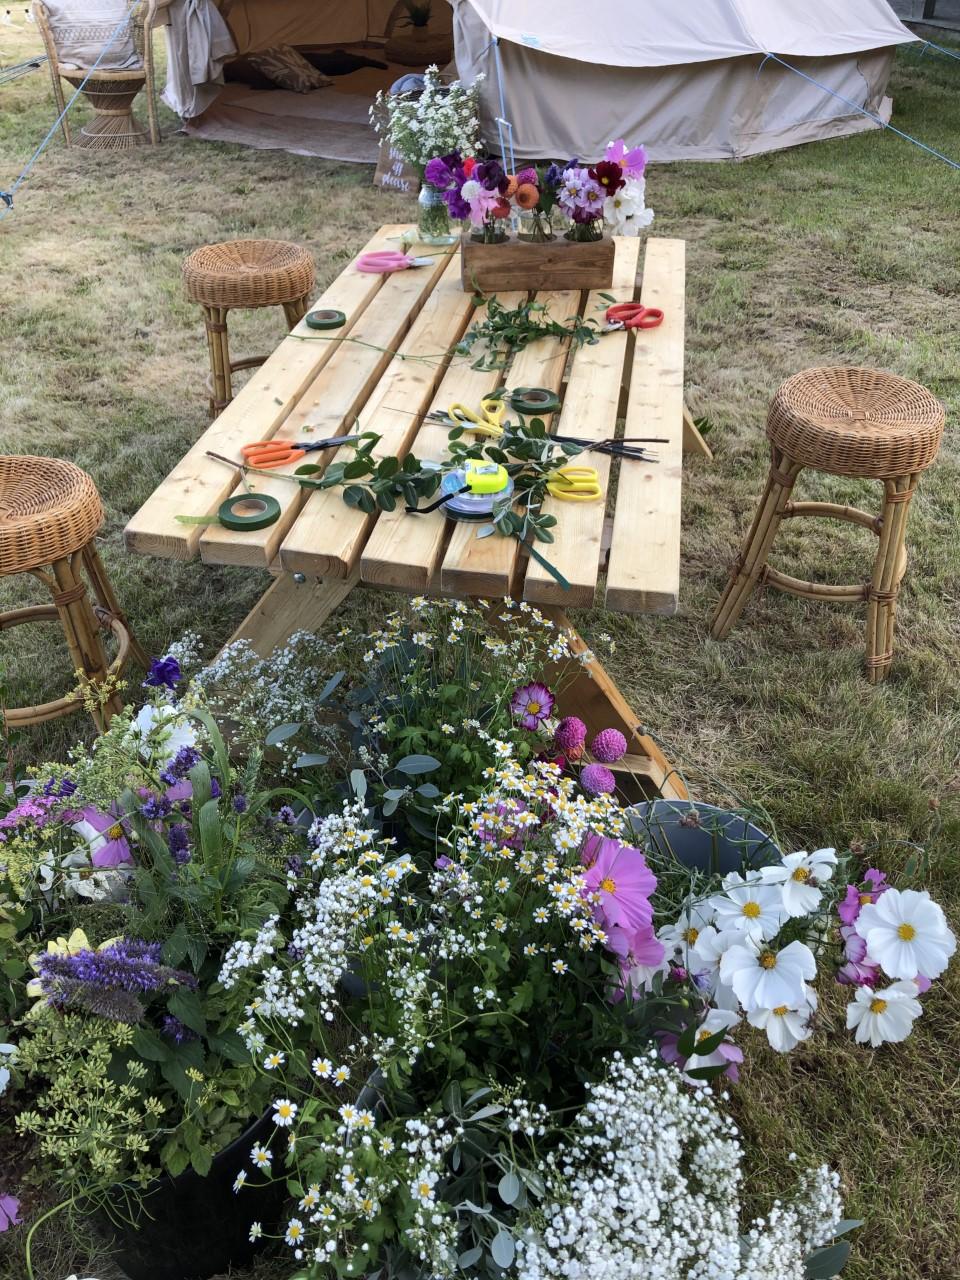 Yewbarrow Flower Farm